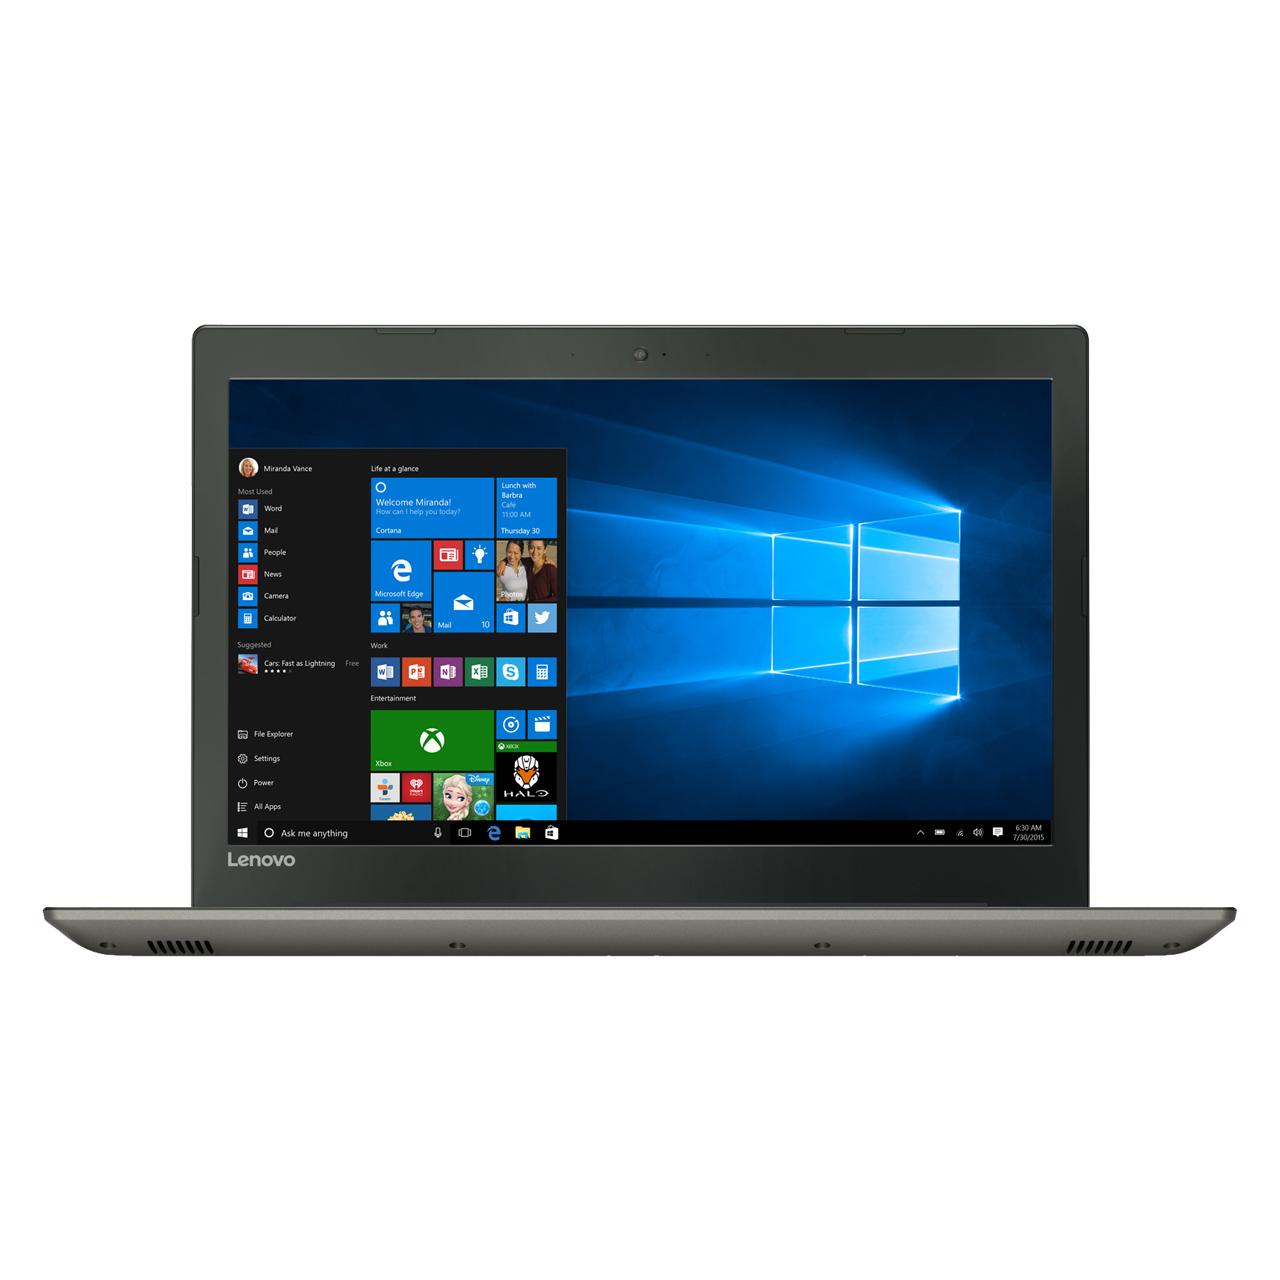 لپ تاپ 15 اینچی لنوو مدل Ideapad 520 - M